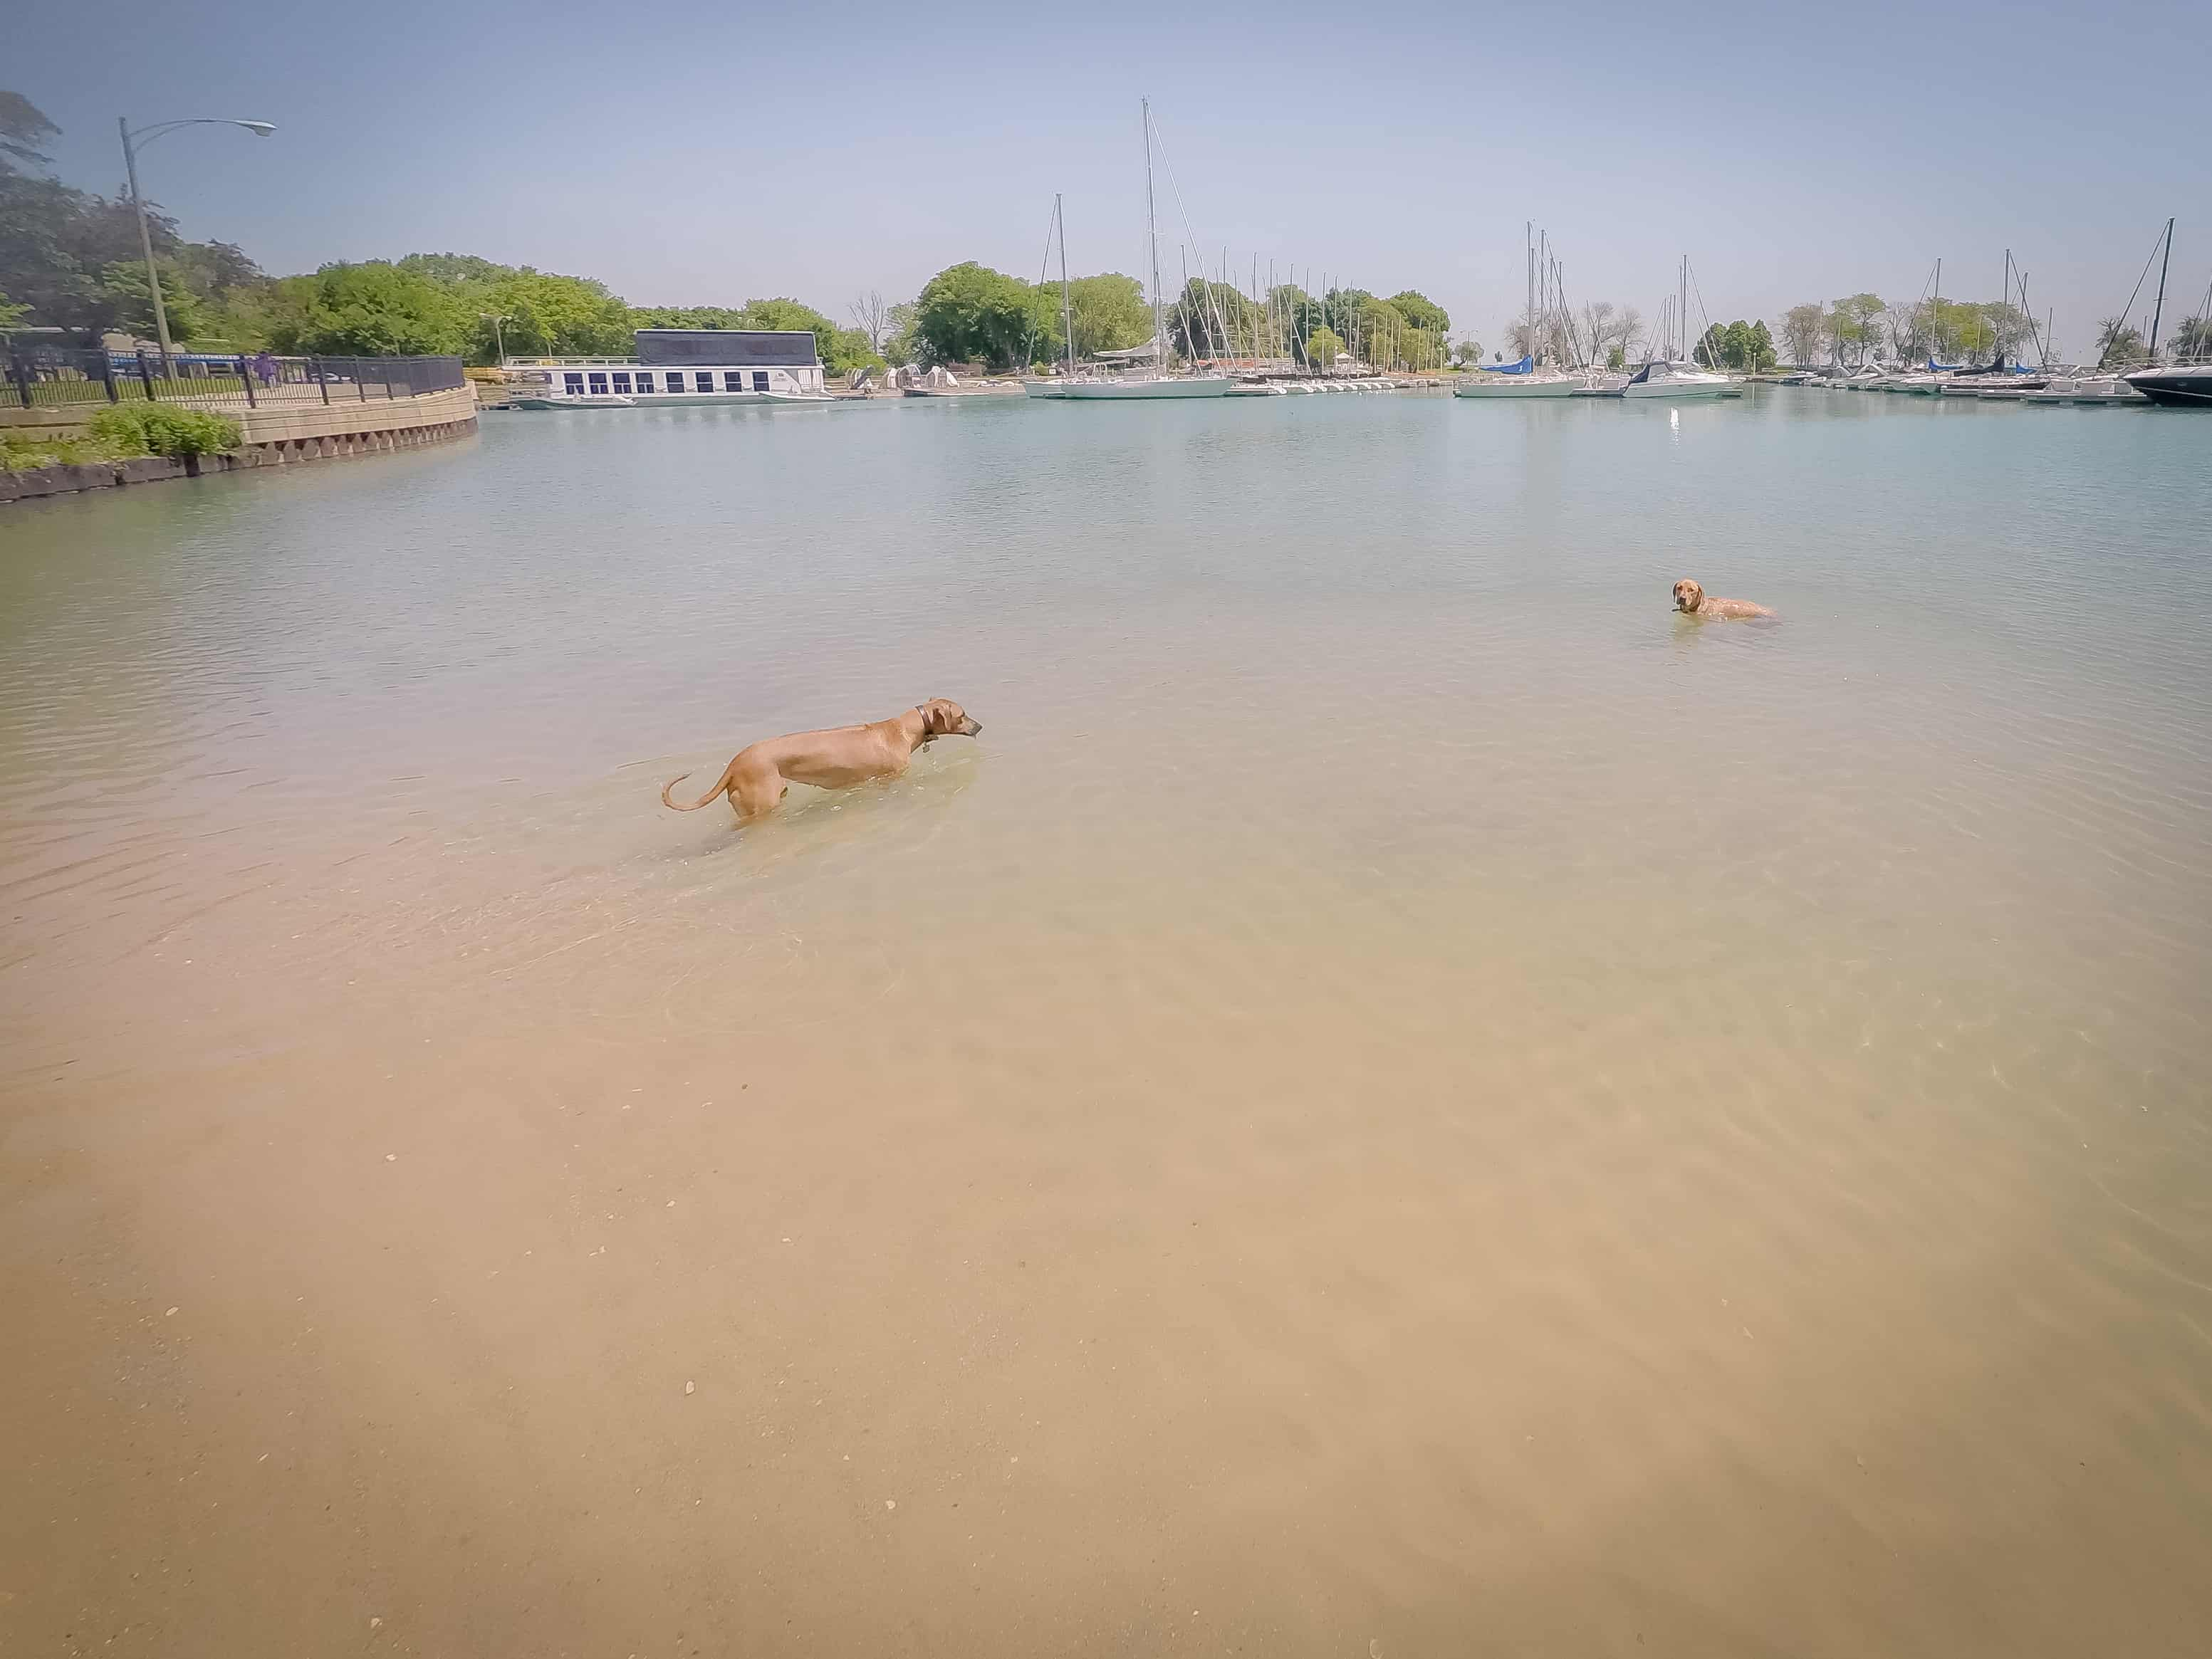 Rhodesian Ridgeback, cute, puppy, chicago, dog beach, adventure.